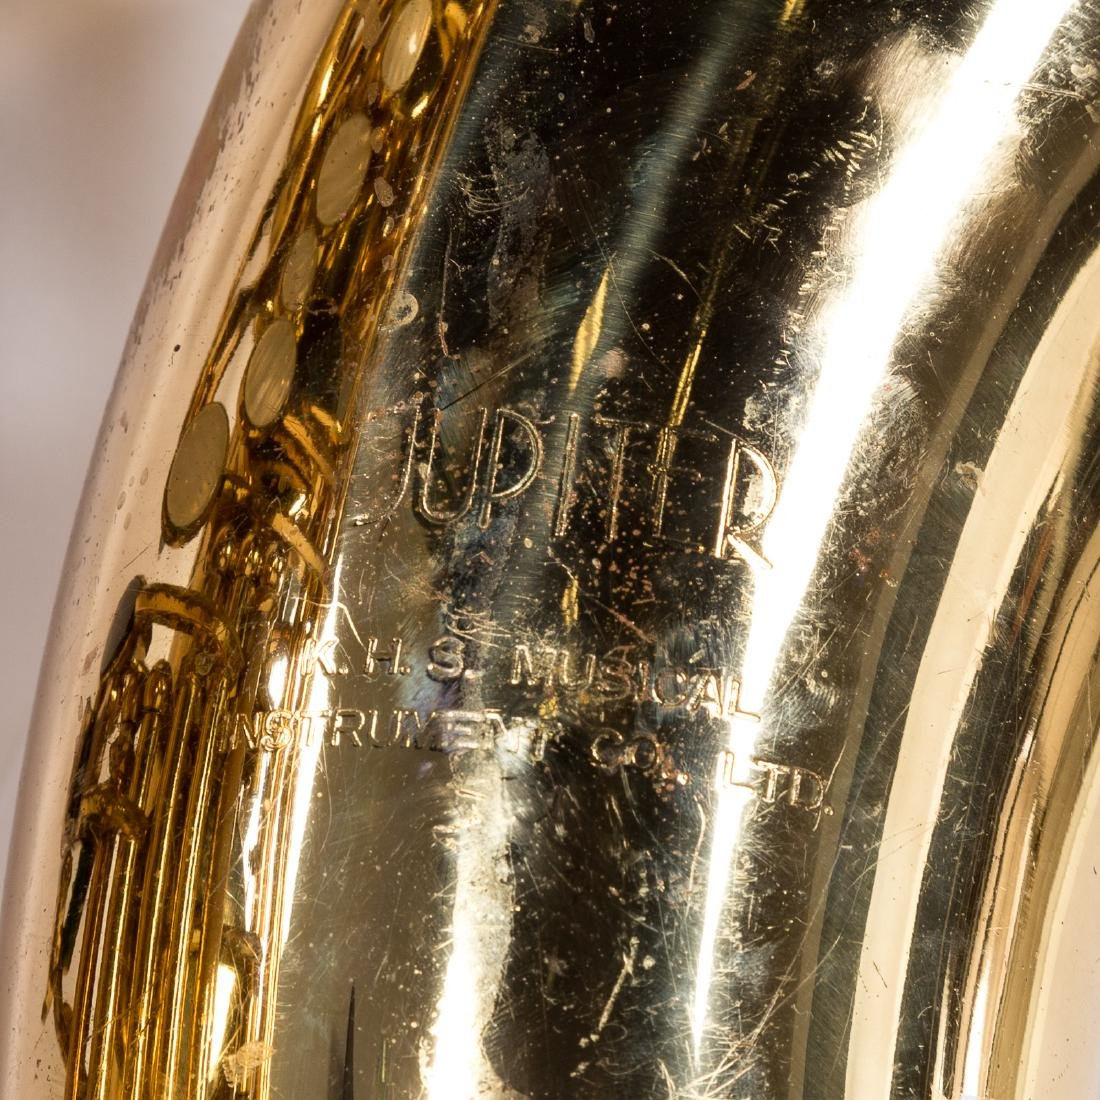 K.H.S. Jupiter alto saxophone - 5